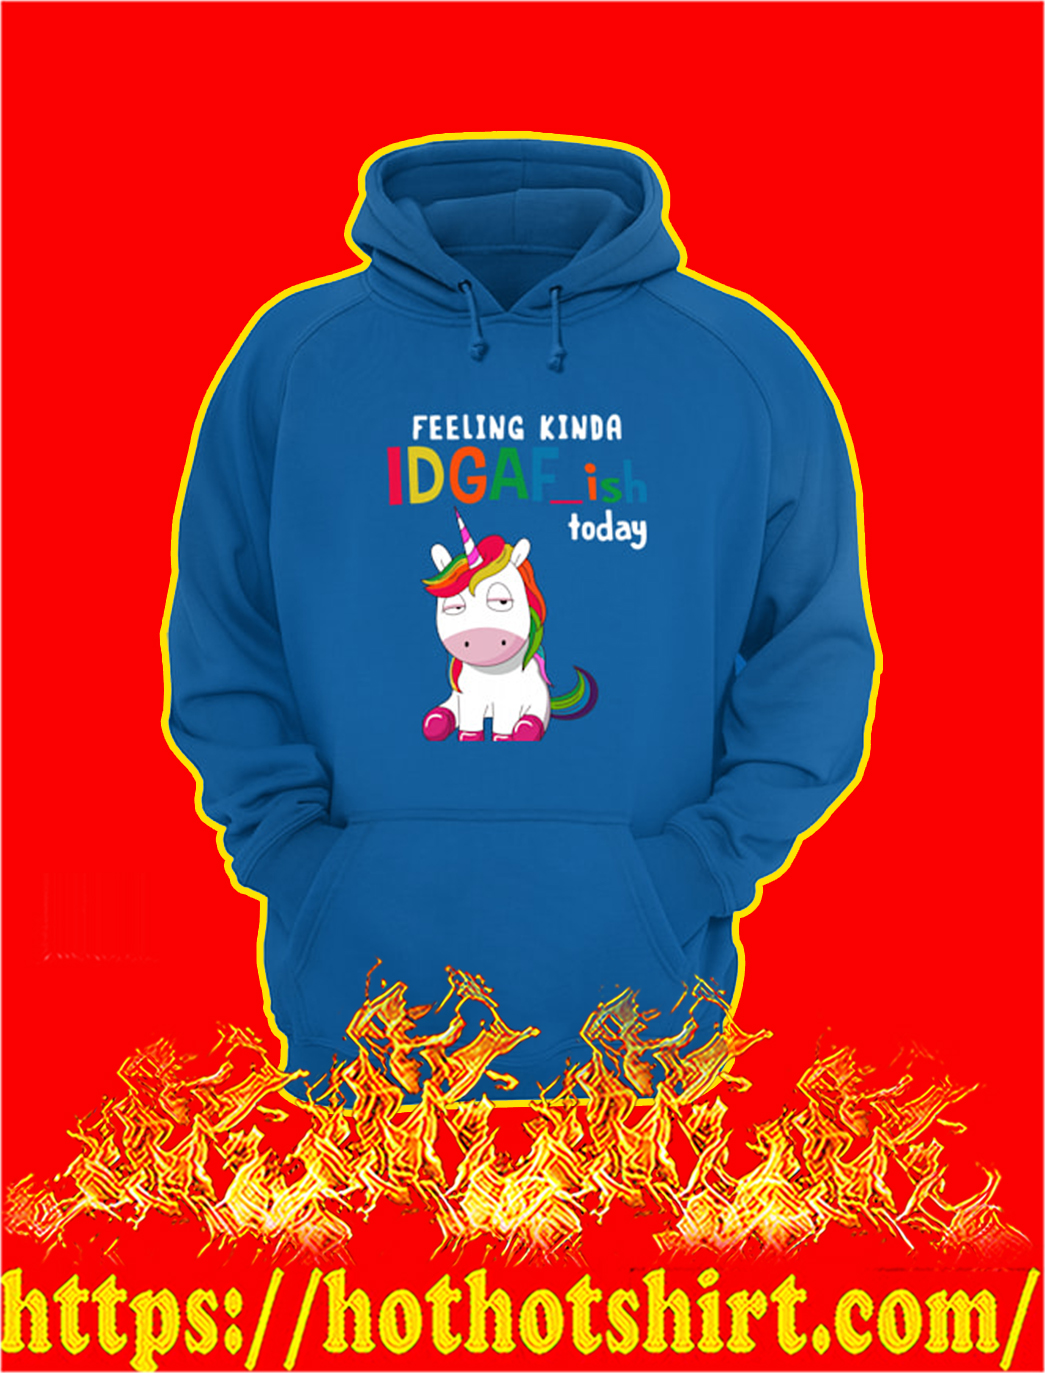 Unicorn Feeling Kinda IDGAF ish Today hoodie